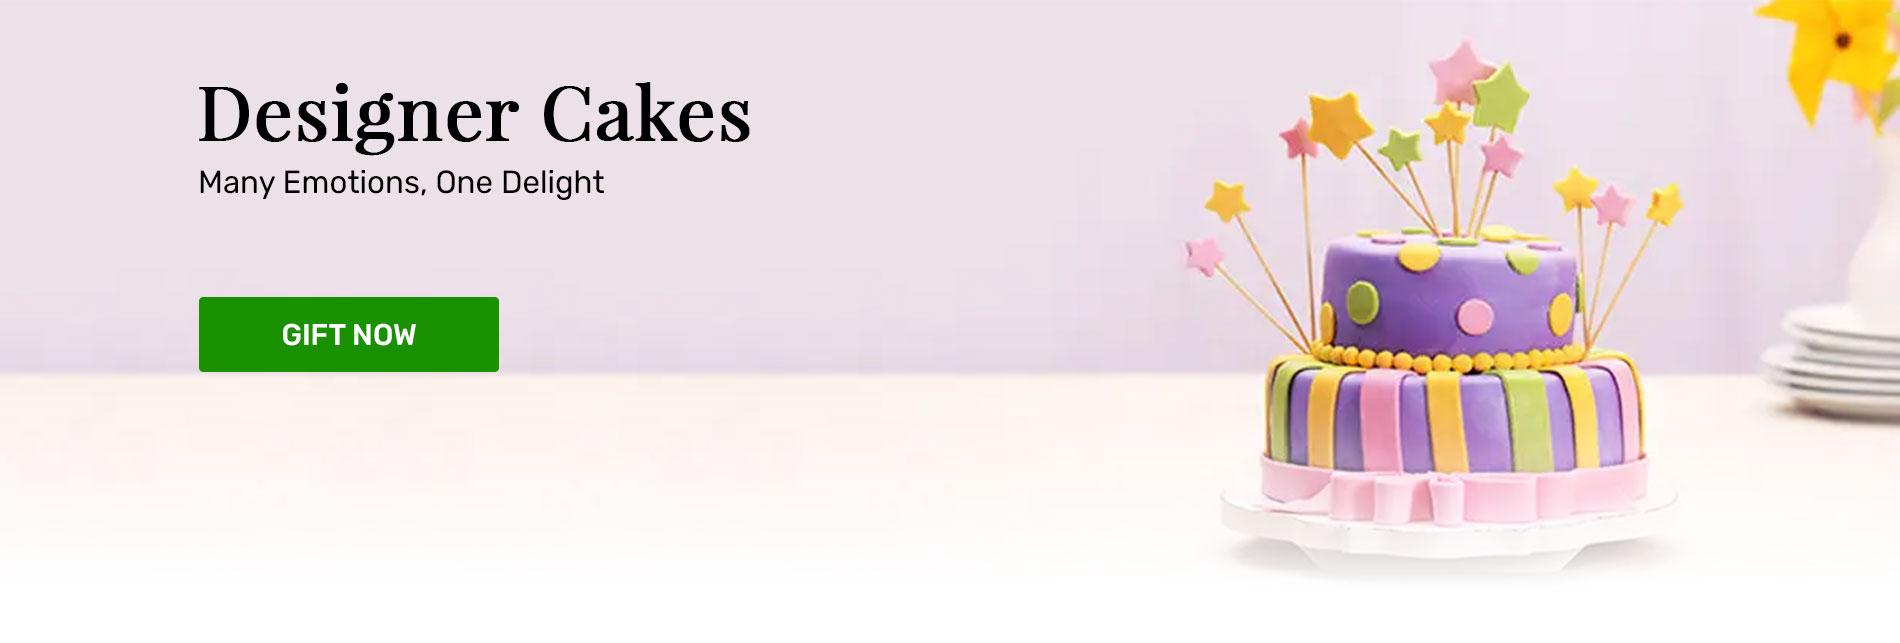 Send designer cakes online